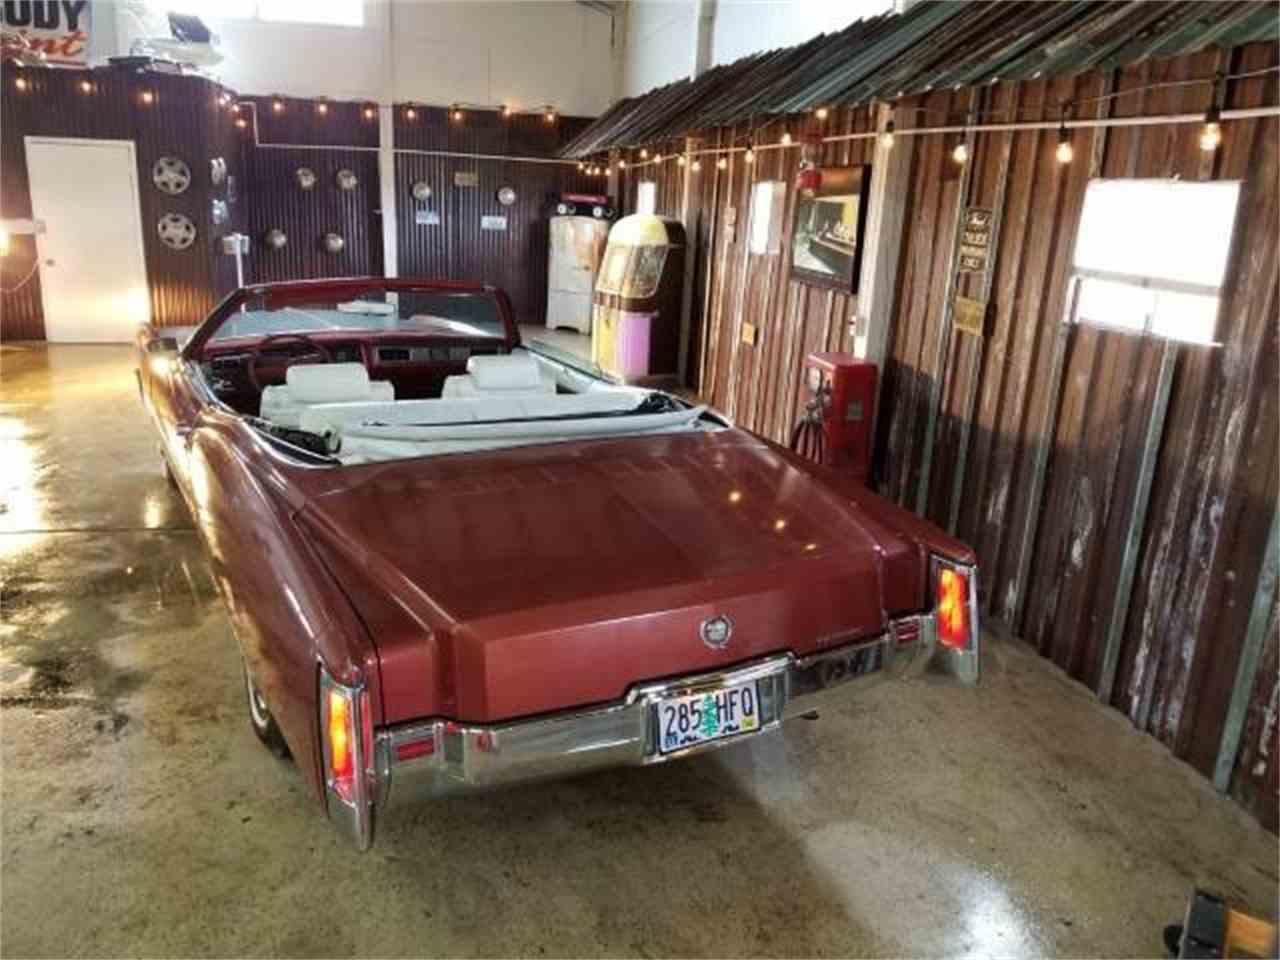 Large Picture of '71 Cadillac Eldorado located in Redmond Oregon - $12,500.00 - MZBR